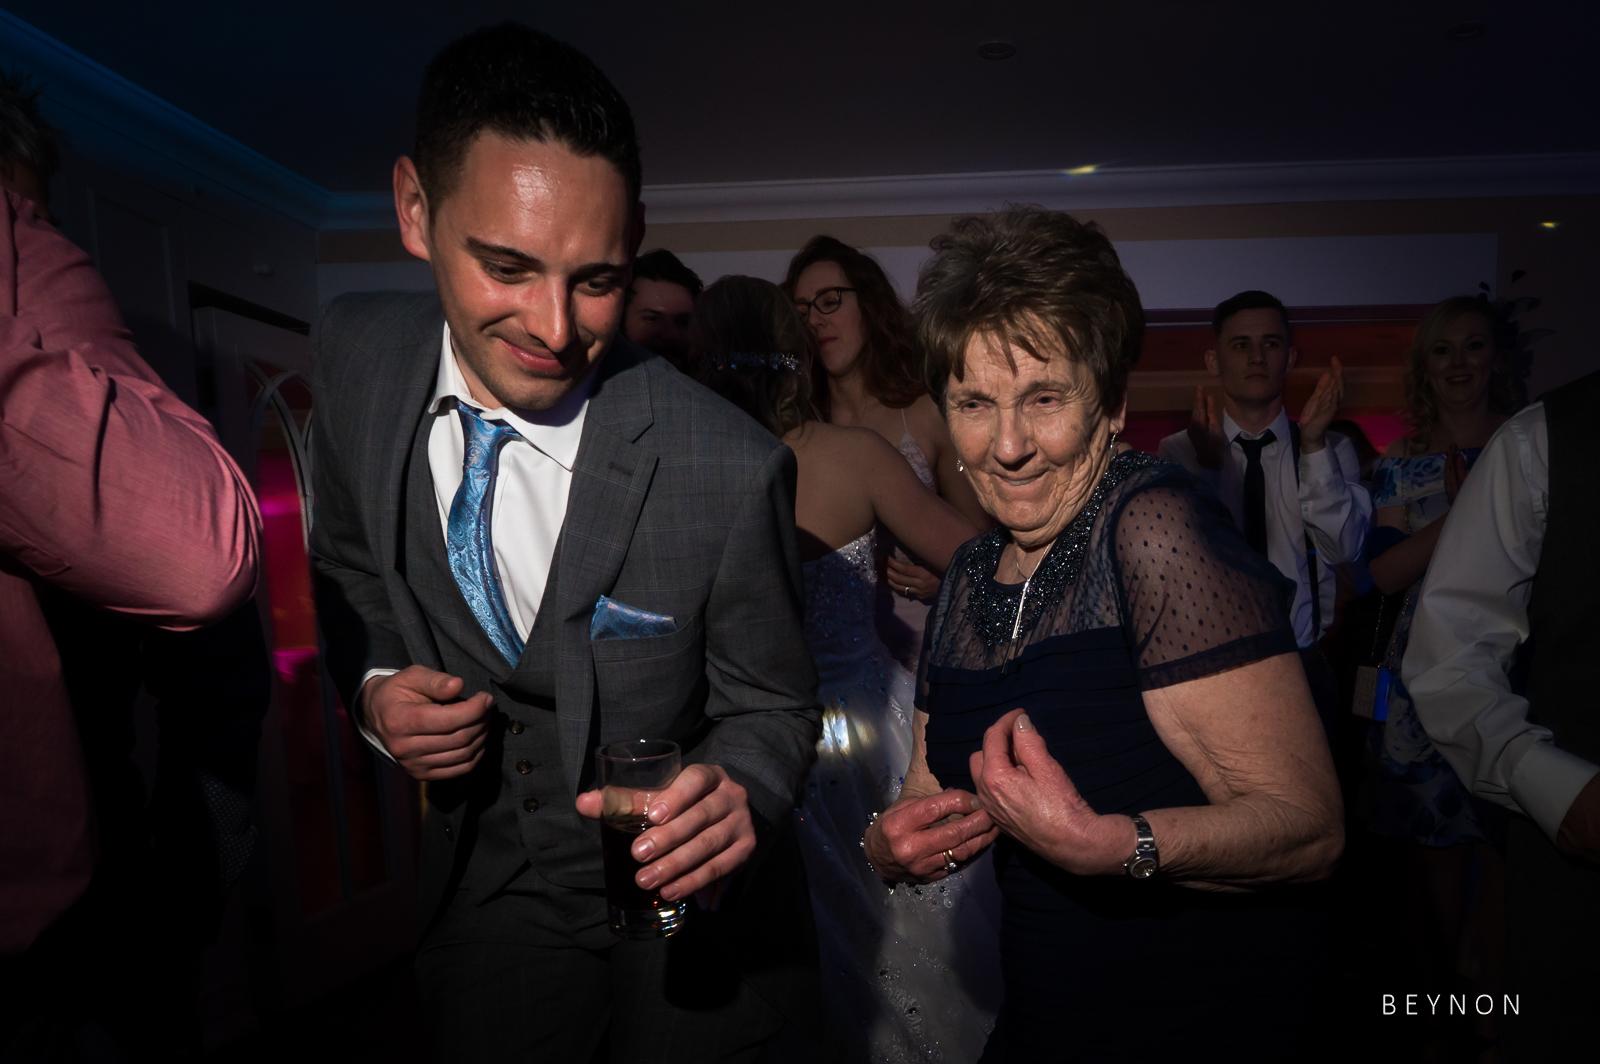 Grandma is on the dancefloor